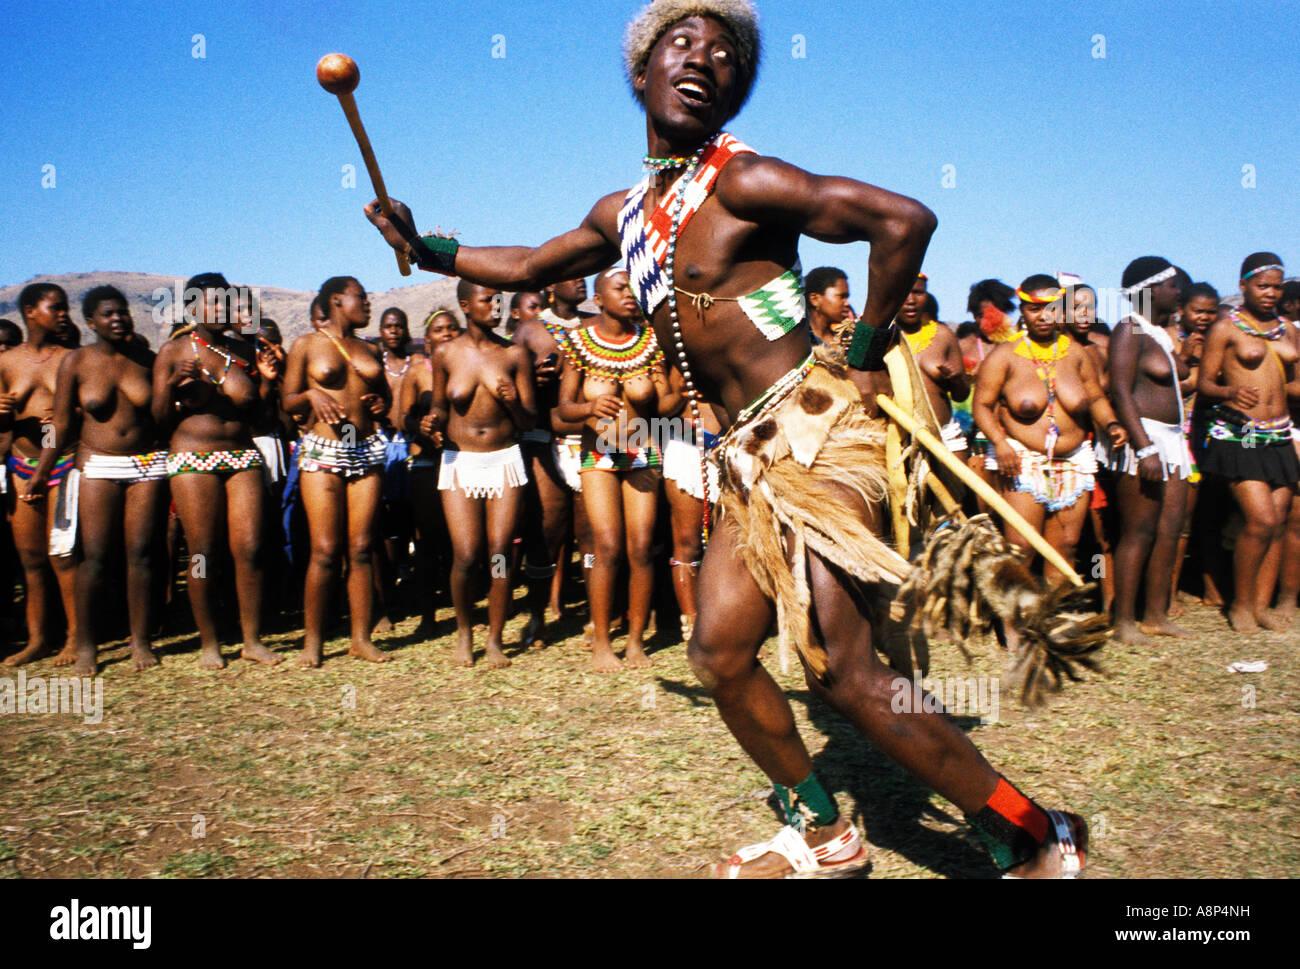 Zulu reed dance ceremonial participants natal south africa stock zulu reed dance ceremonial participants natal south africa stopboris Images